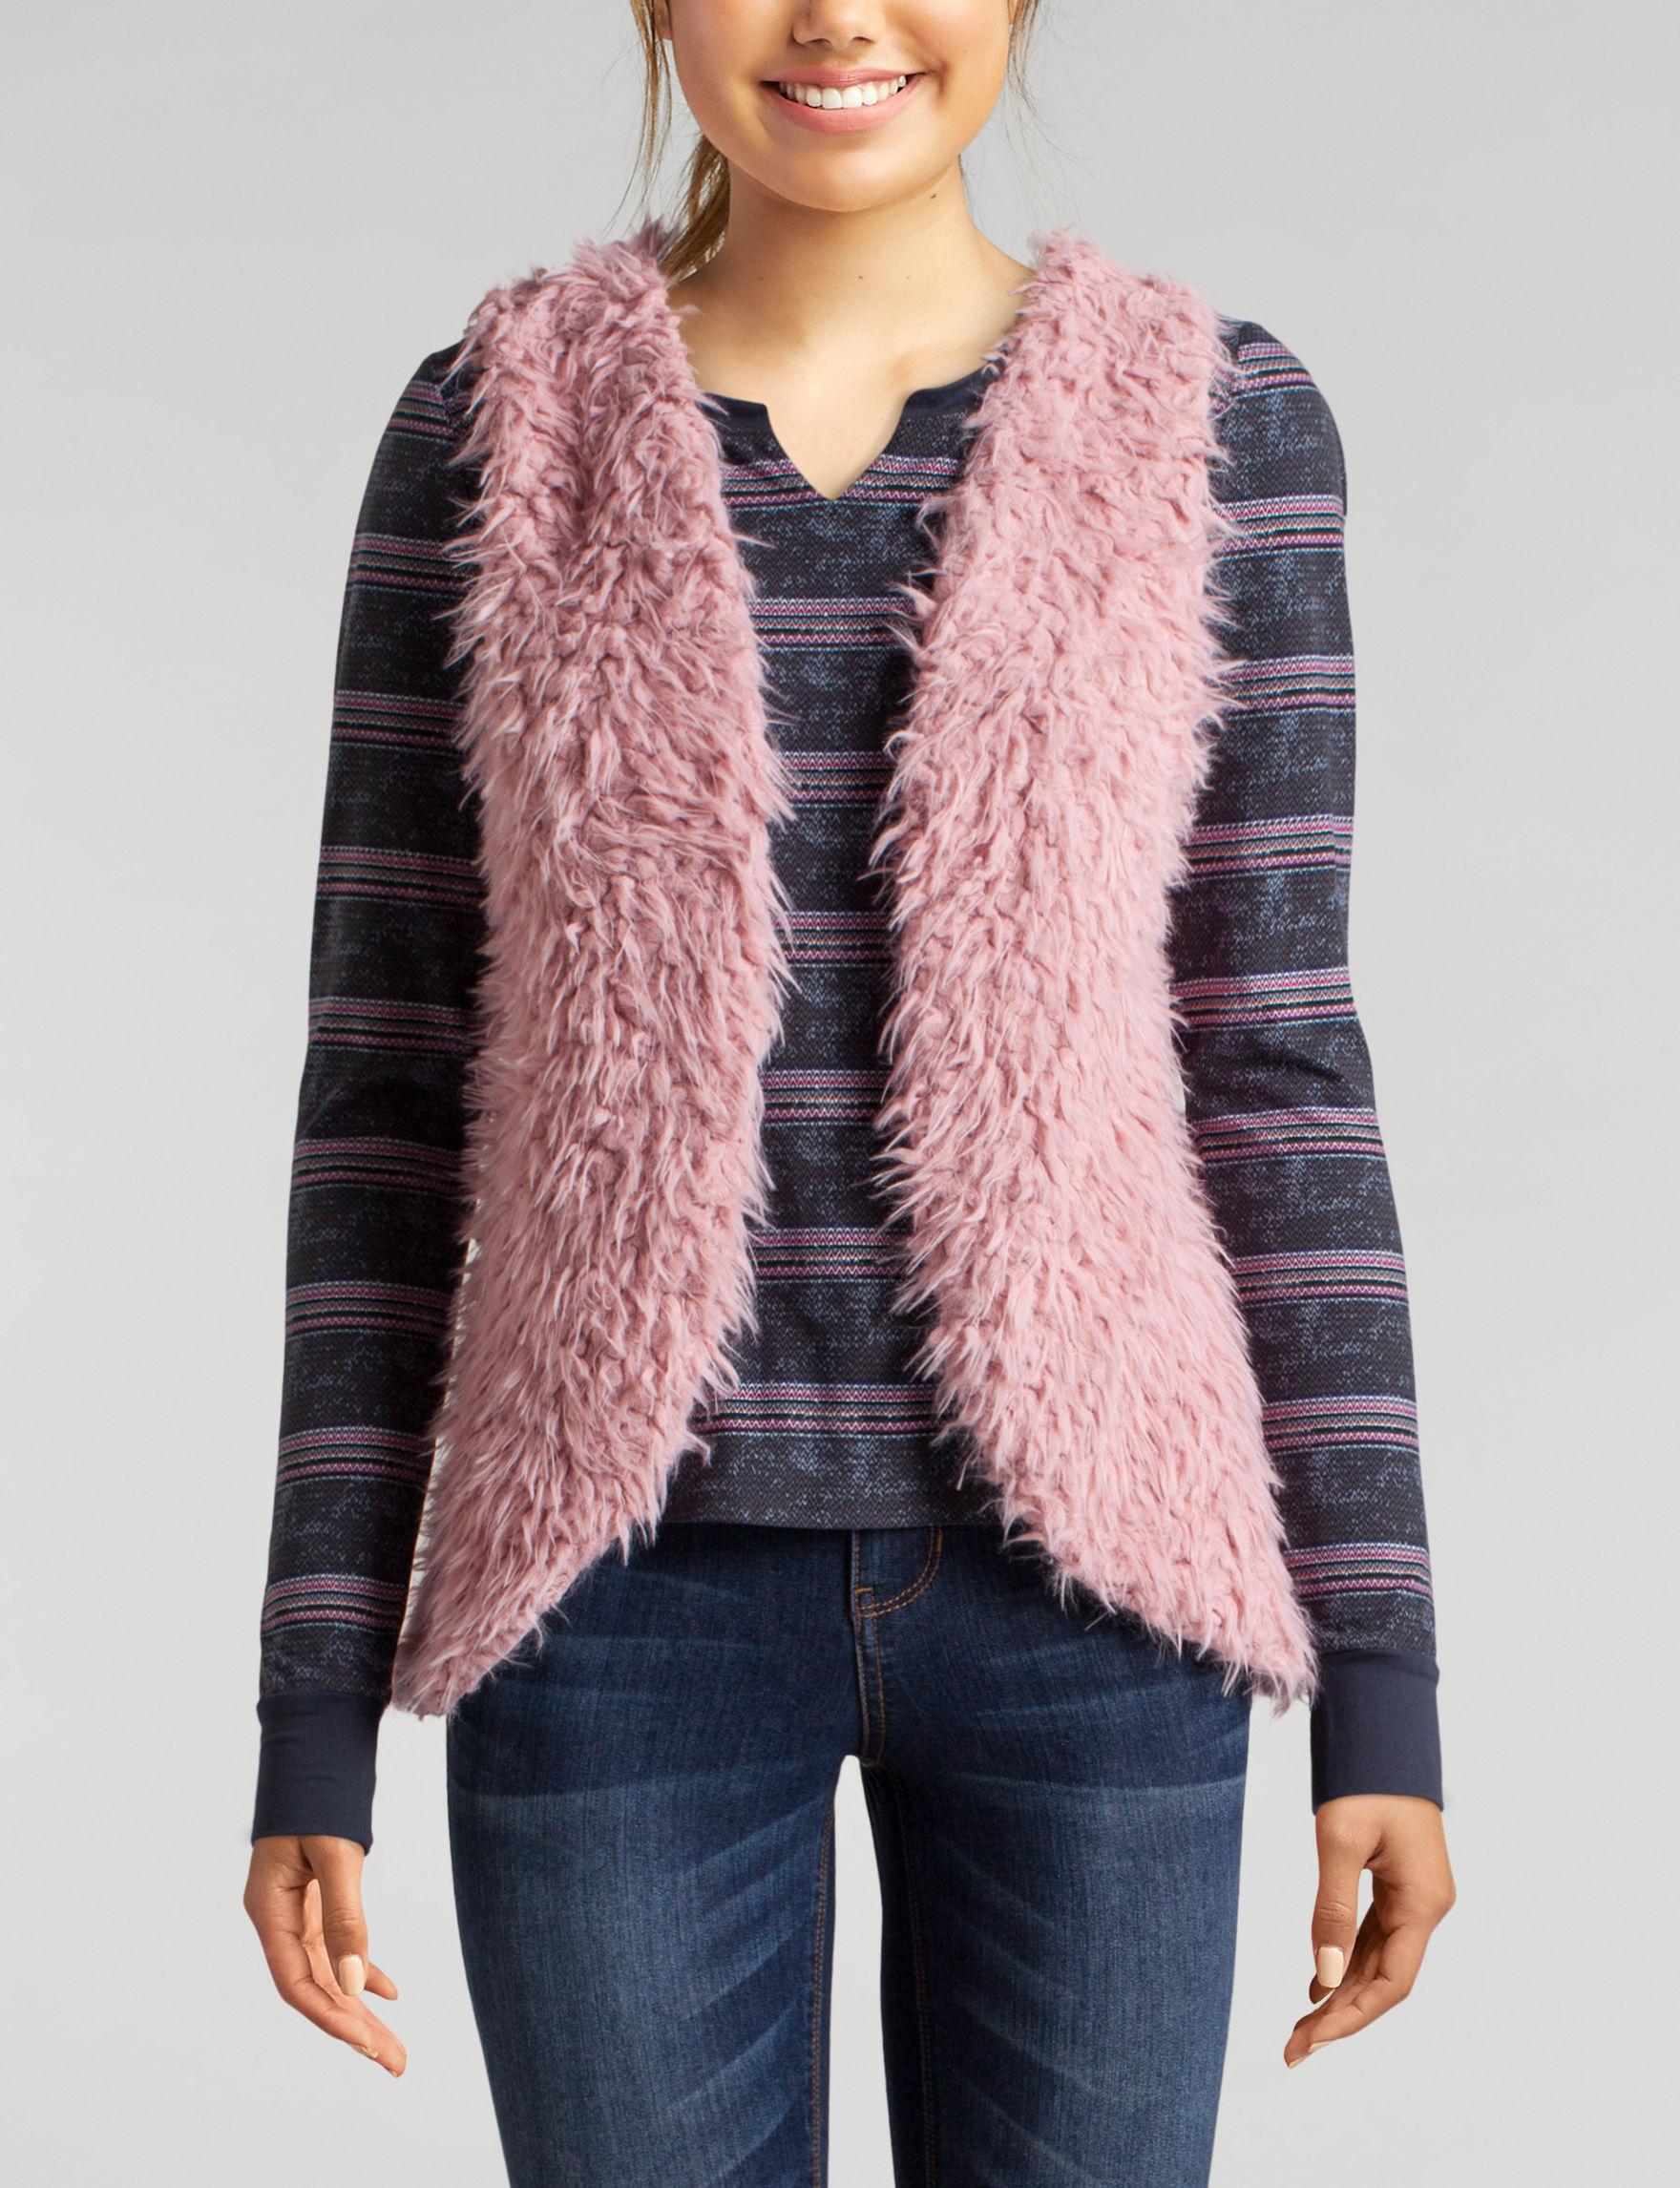 Self Esteem Rose Shirts & Blouses Vests